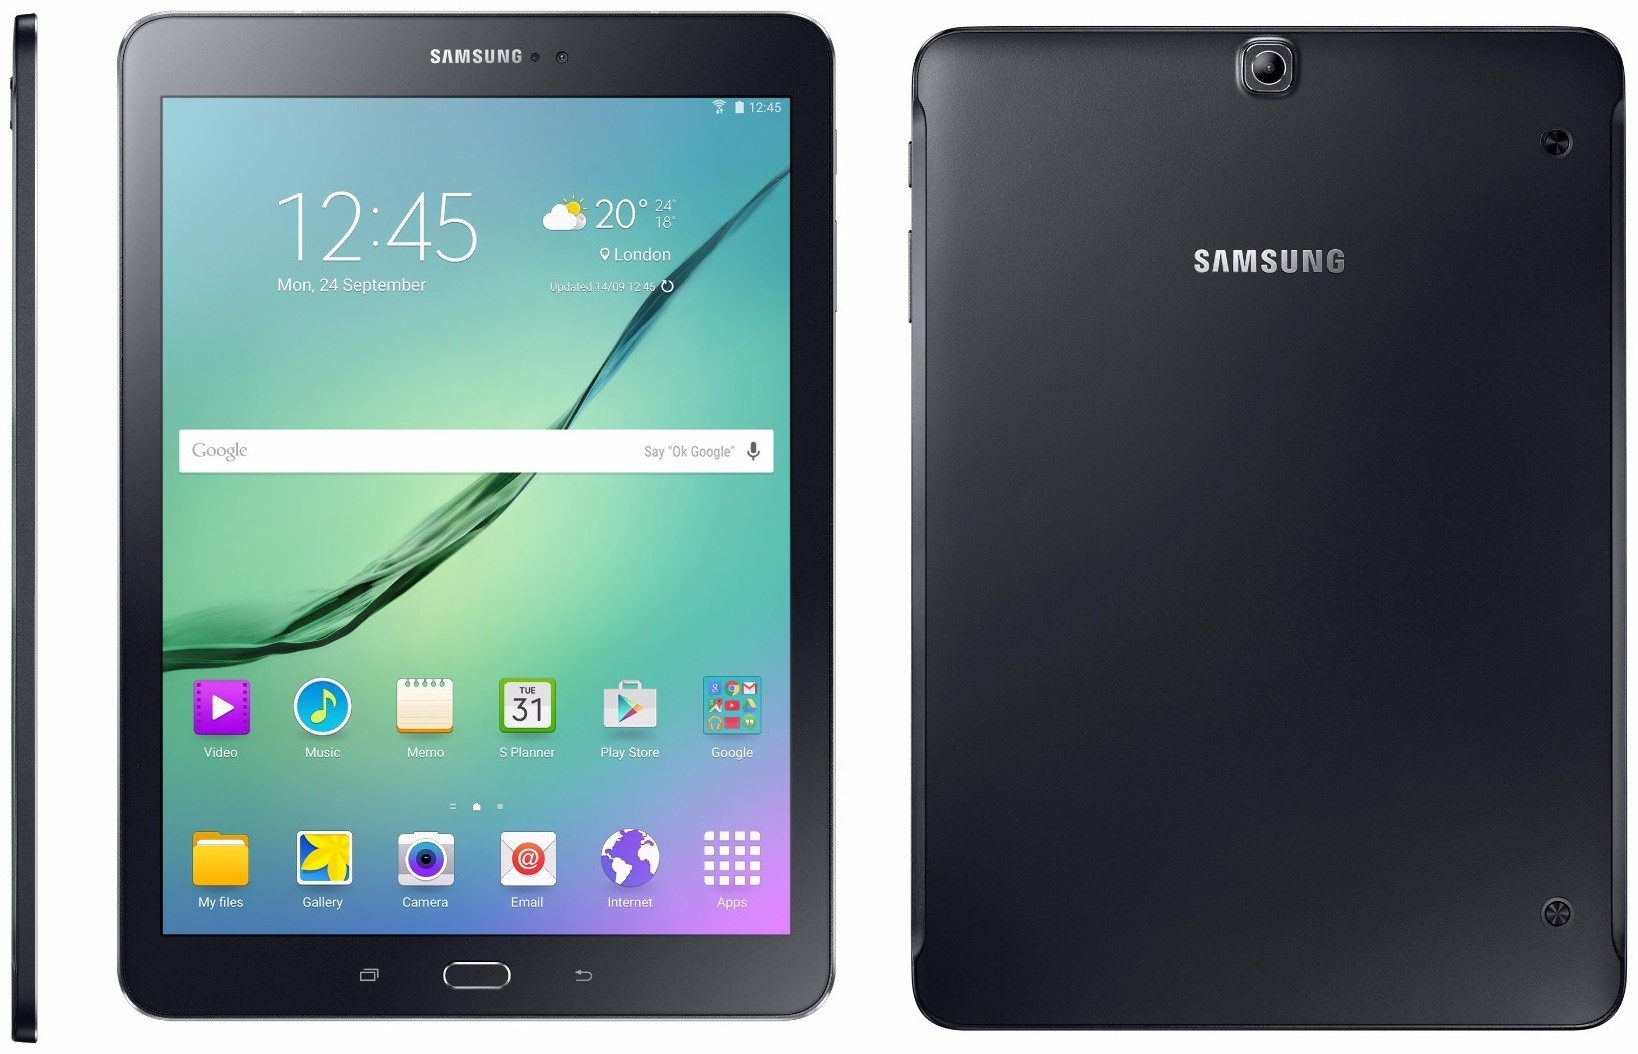 Samsung Galaxy Tab S2 9.7 4G SM-T815 32GB